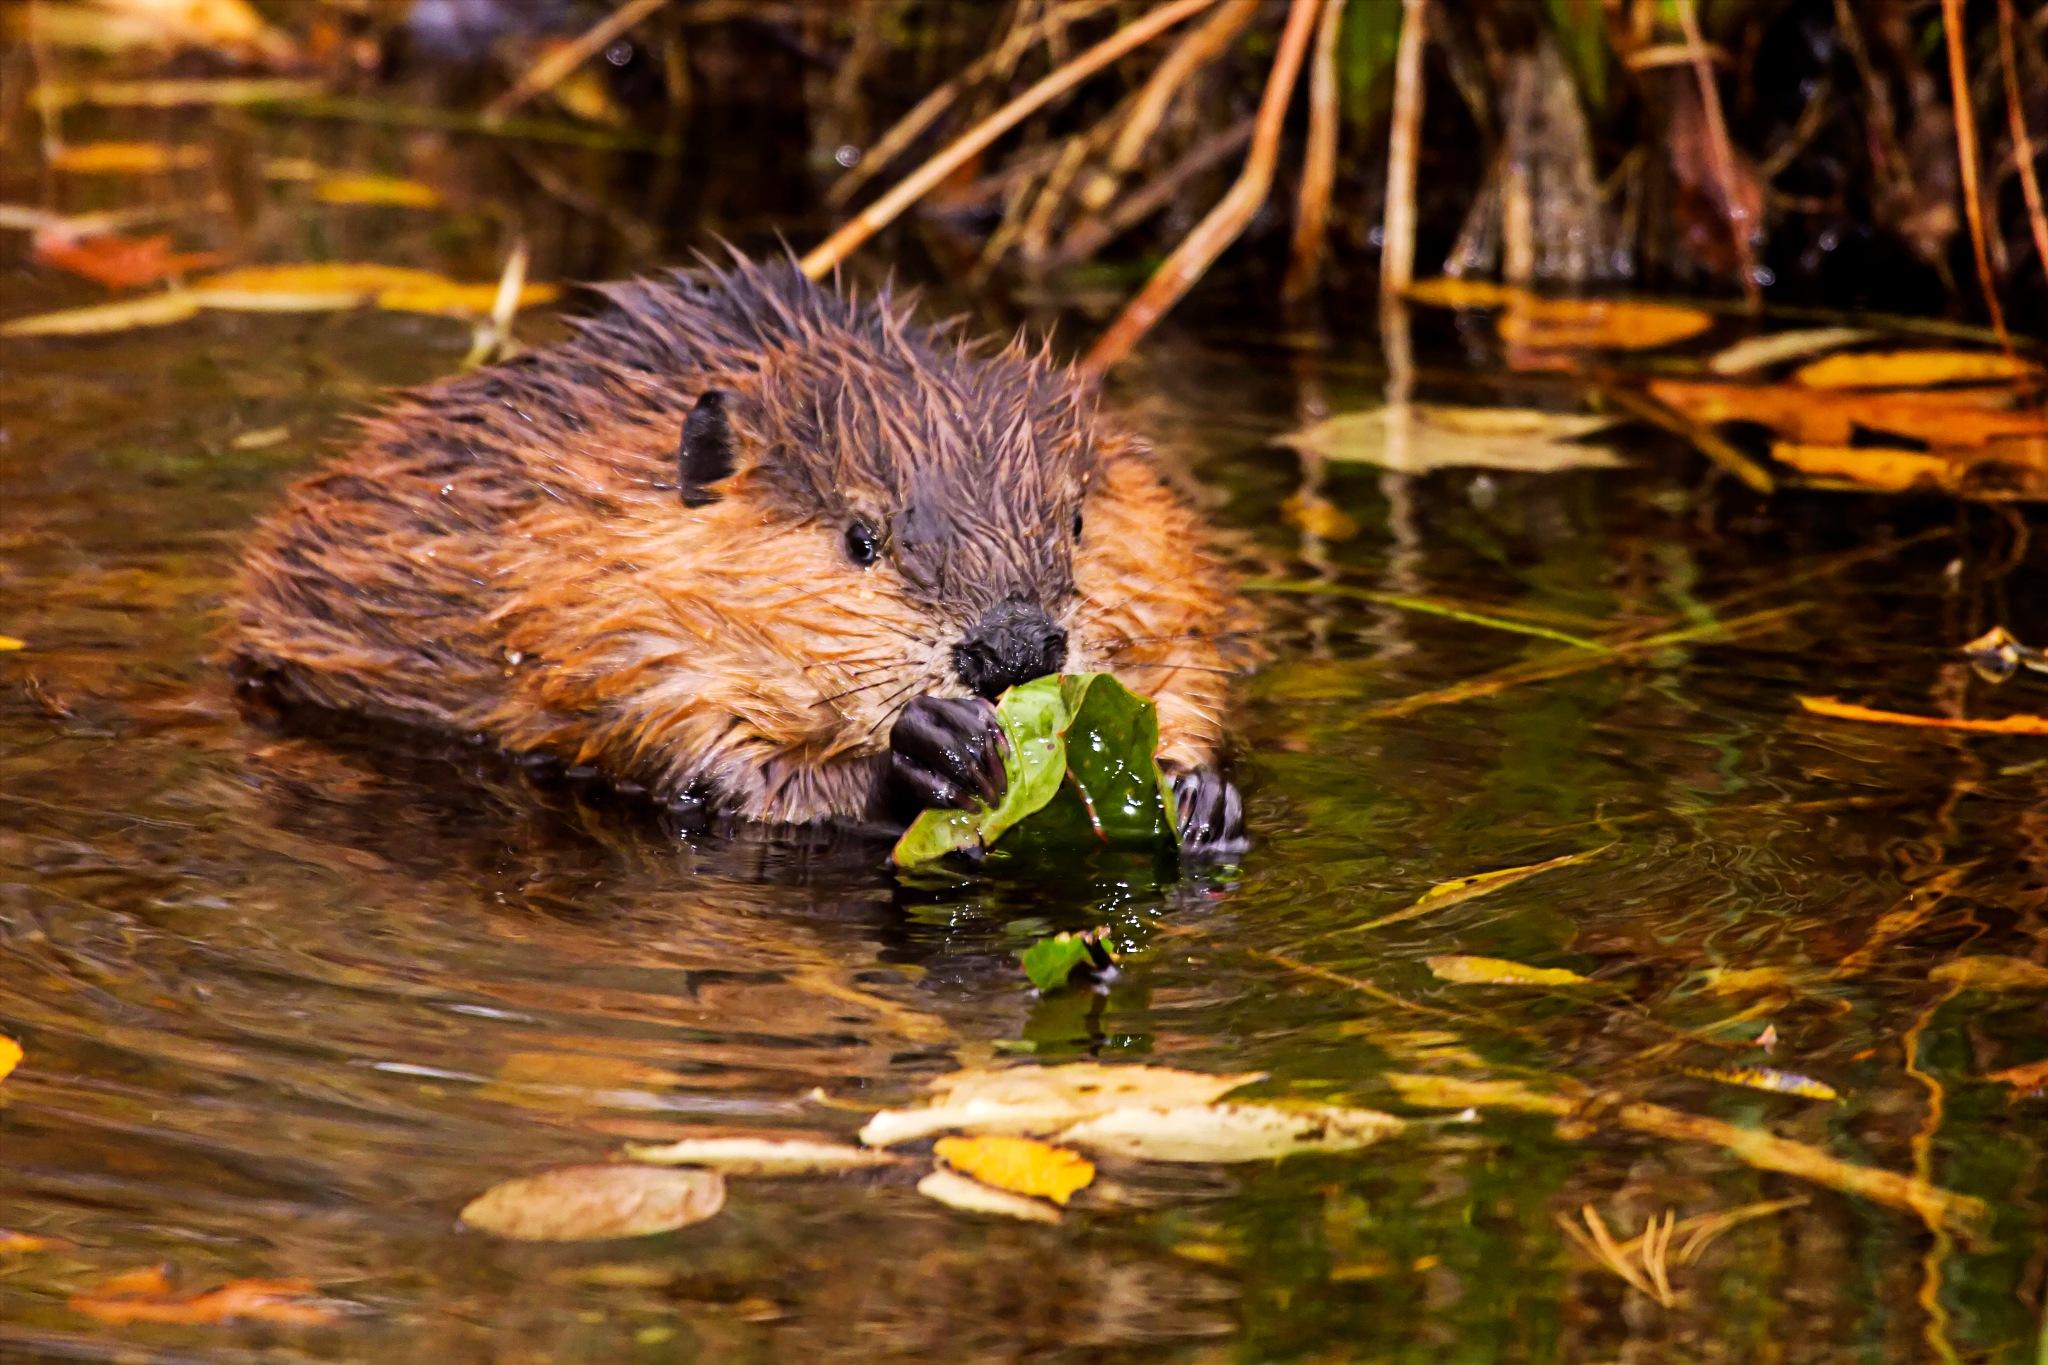 Beaver Eating by almartinez